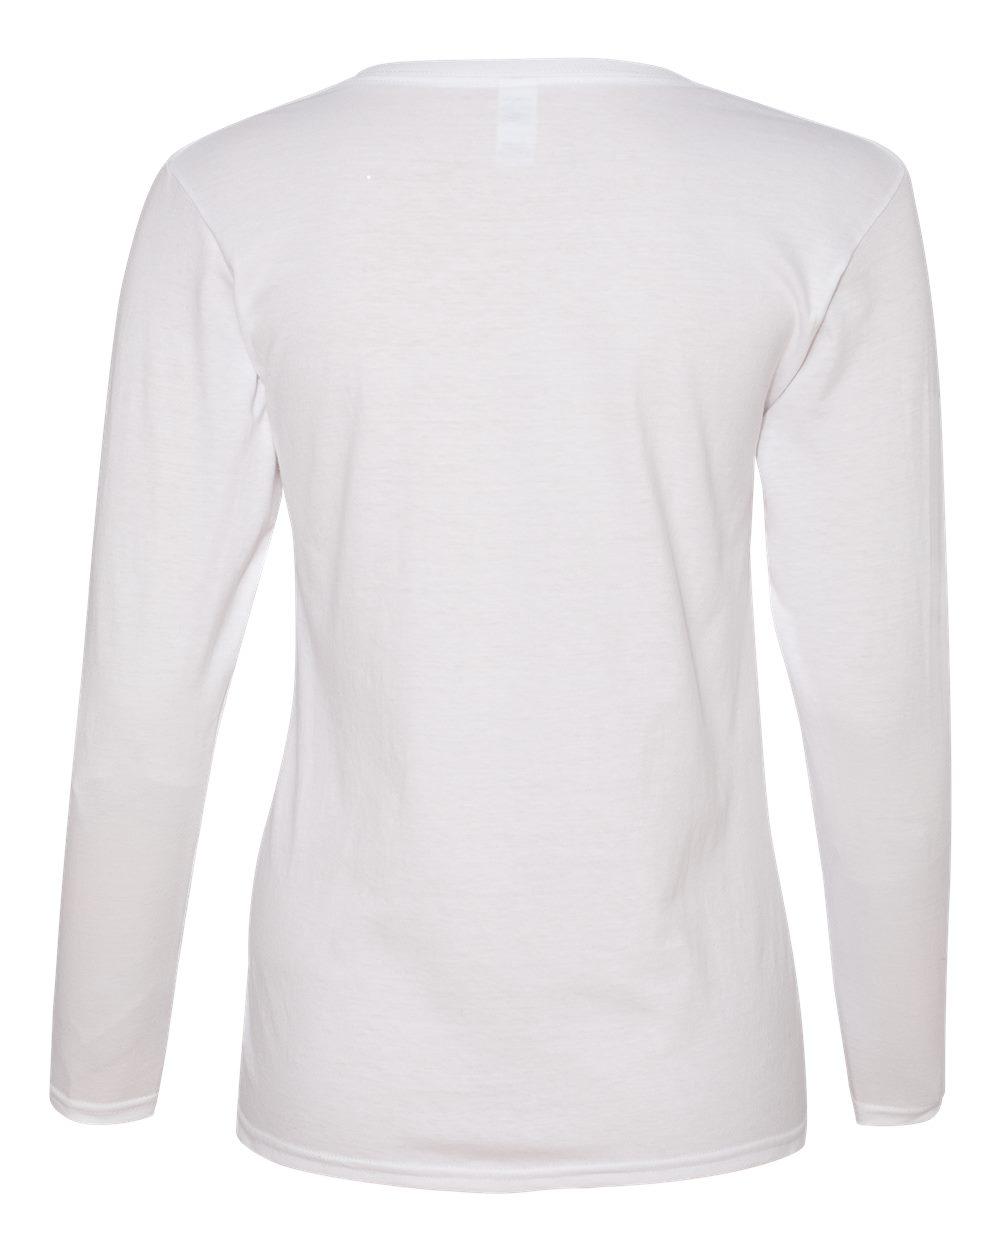 Anvil-Womens-Lightweight-Long-Sleeve-T-Shirt-884L-Size-S-2XL thumbnail 29